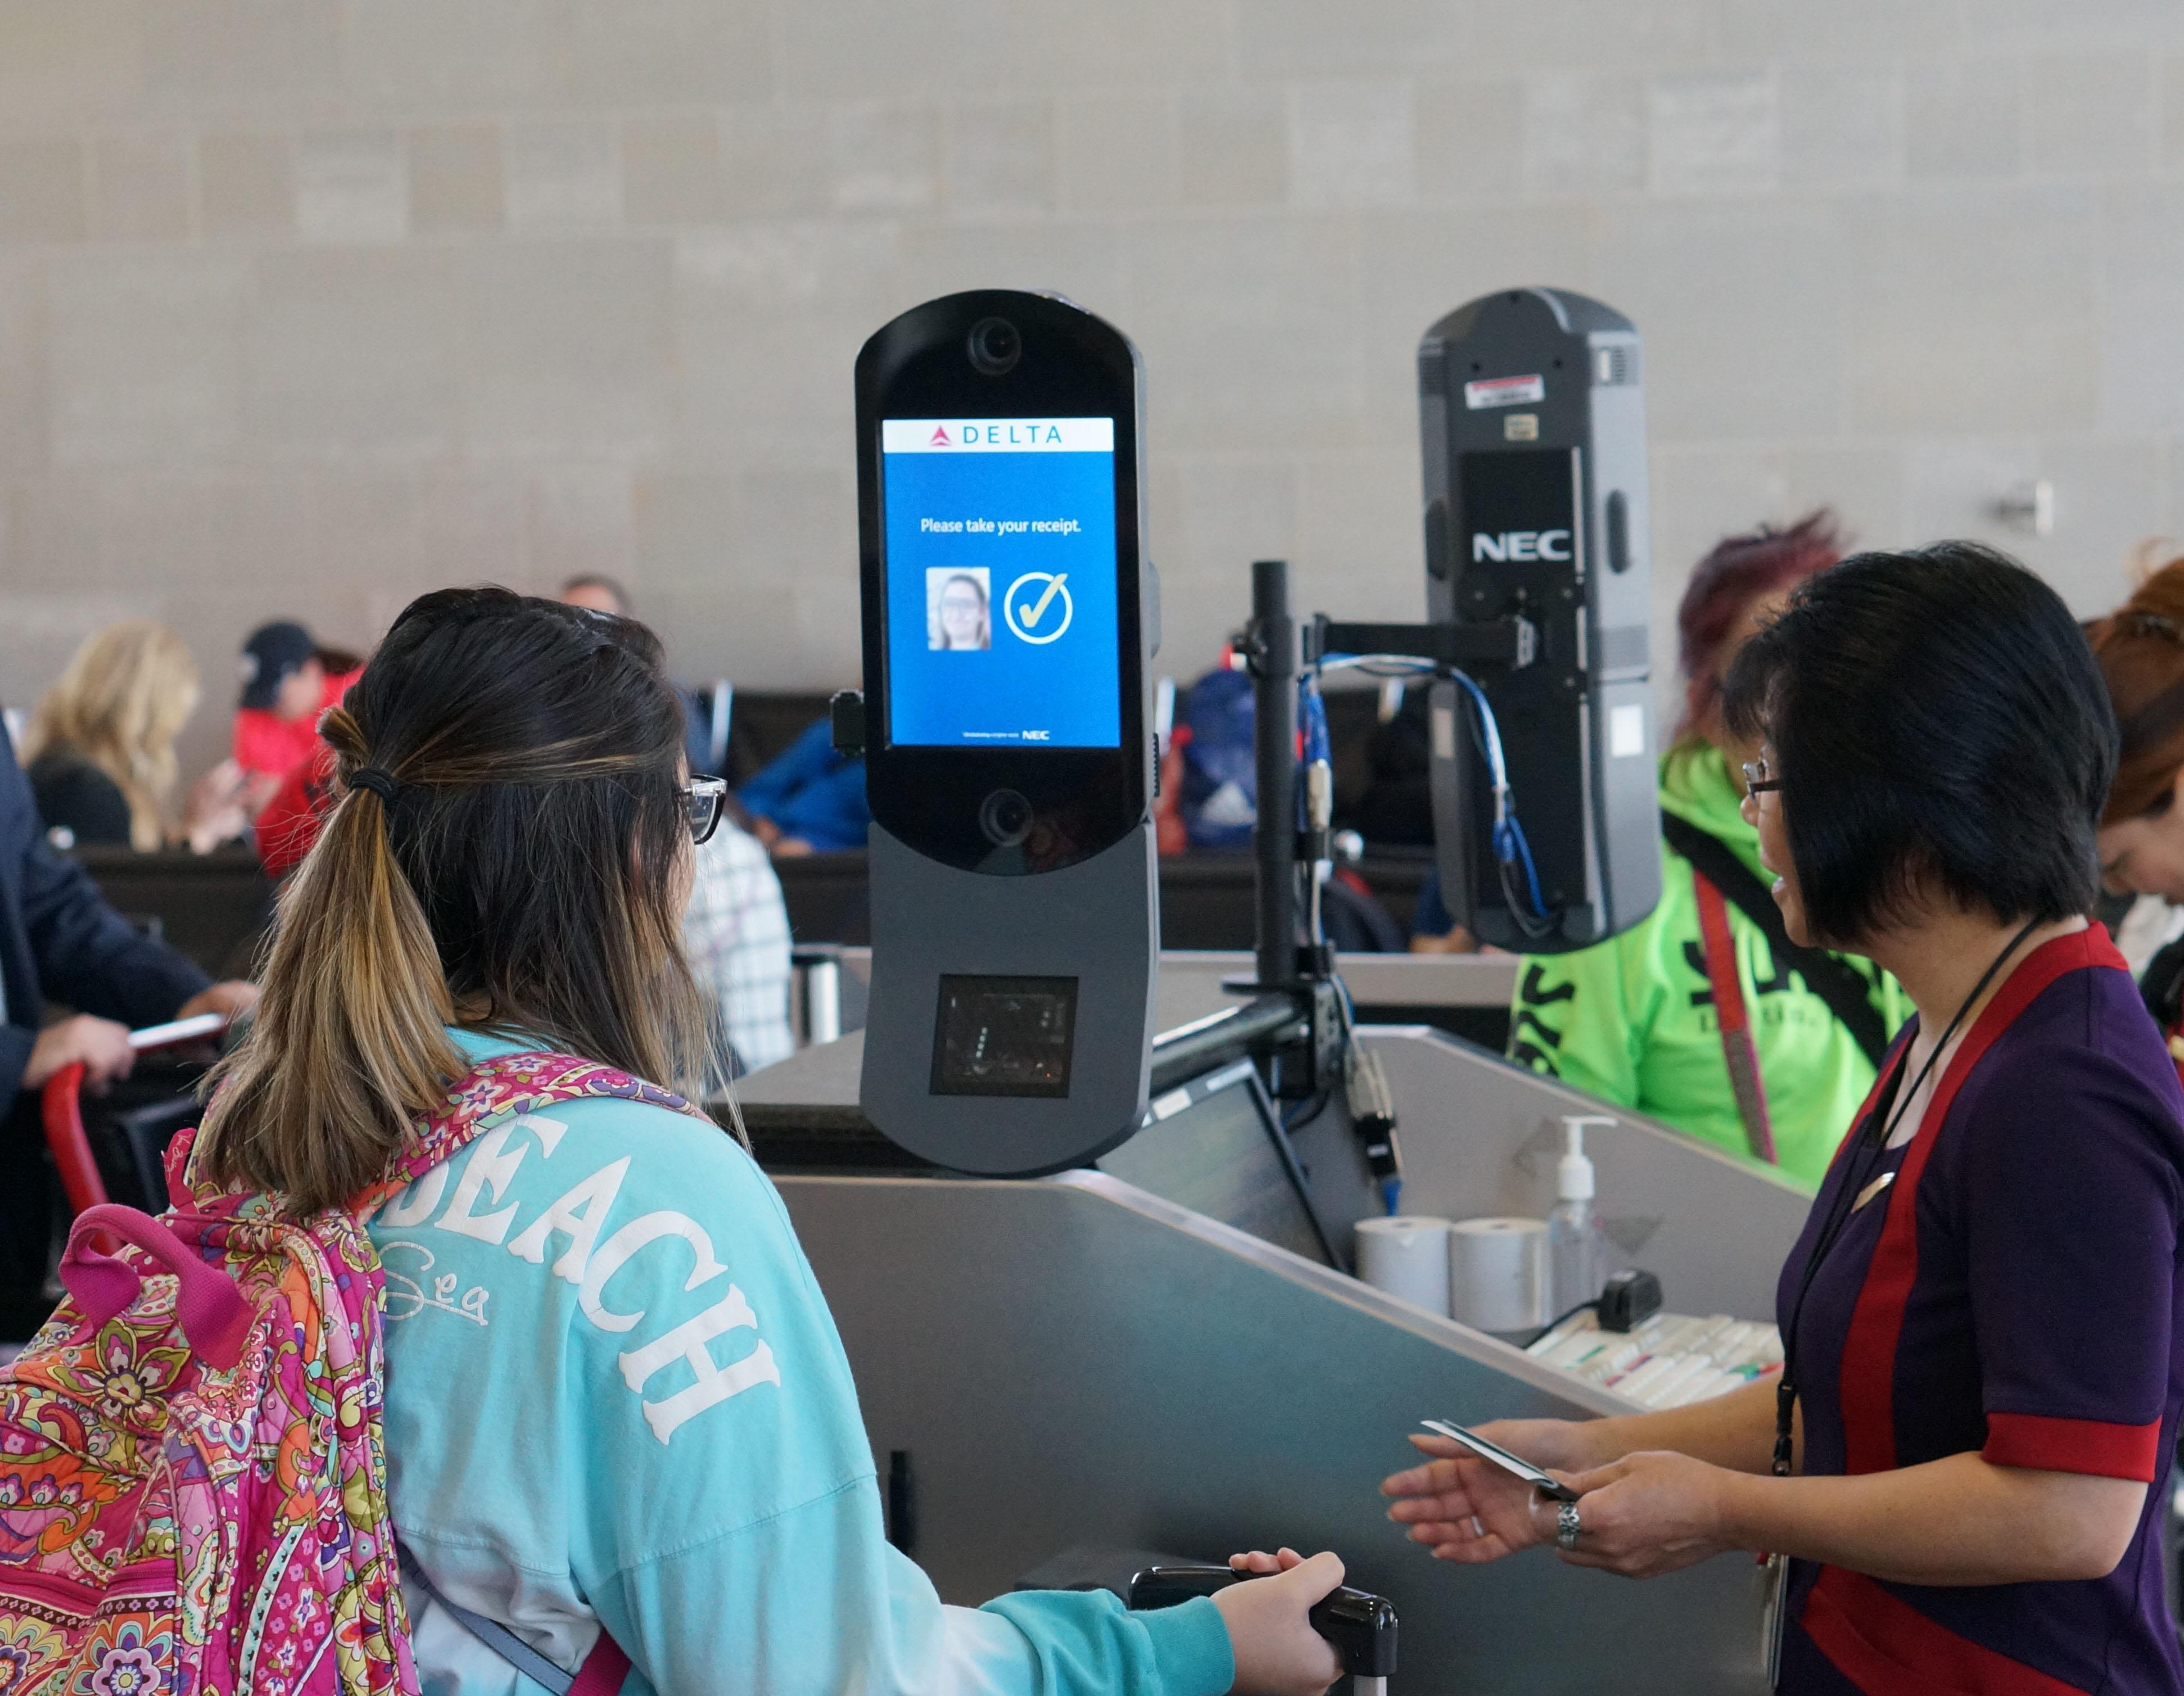 Kết quả hình ảnh cho Delta Using Facial Recognition Throughout ATL International Terminal images